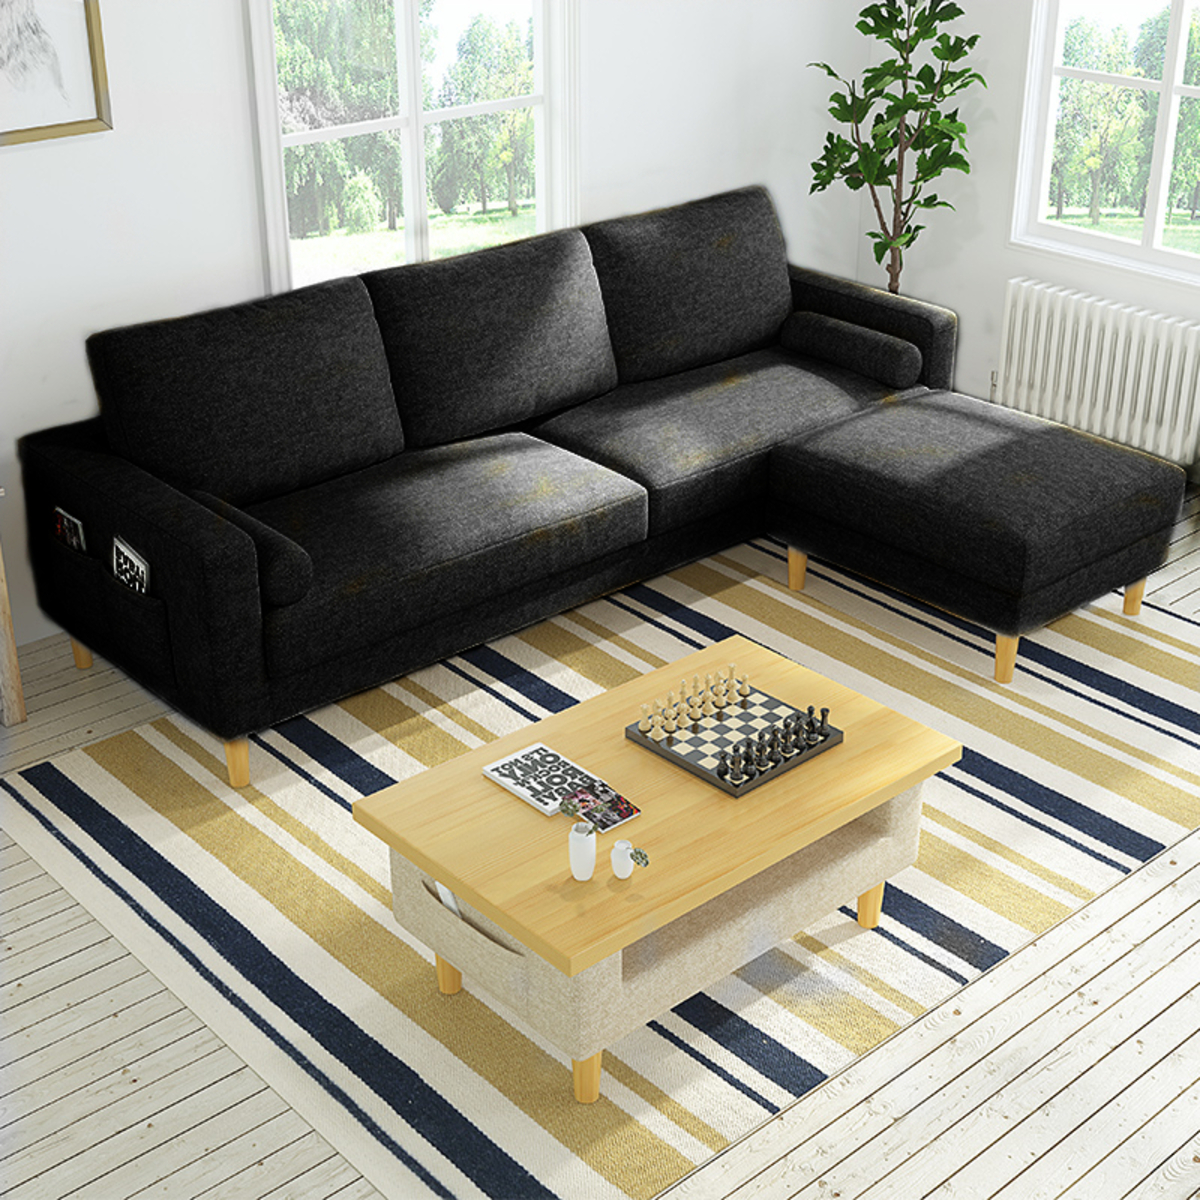 Muebles 3-Seater Braga L-Shaped Sofa (Black) | Go Shop